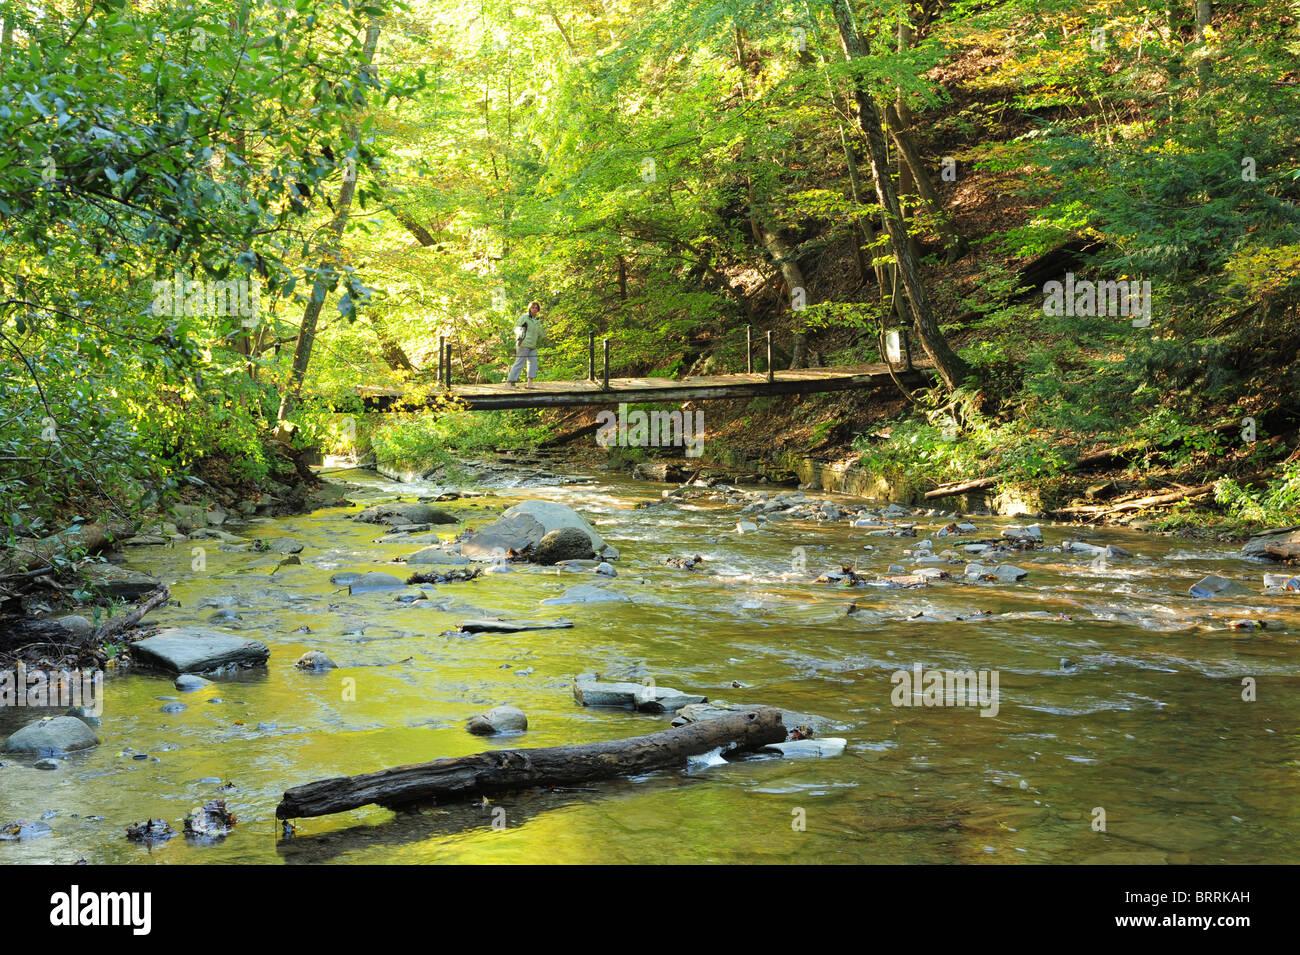 usa-new-york-naples-ny-grimes-glen-ontario-county-canandaigua-lake-BRRKAH.jpg